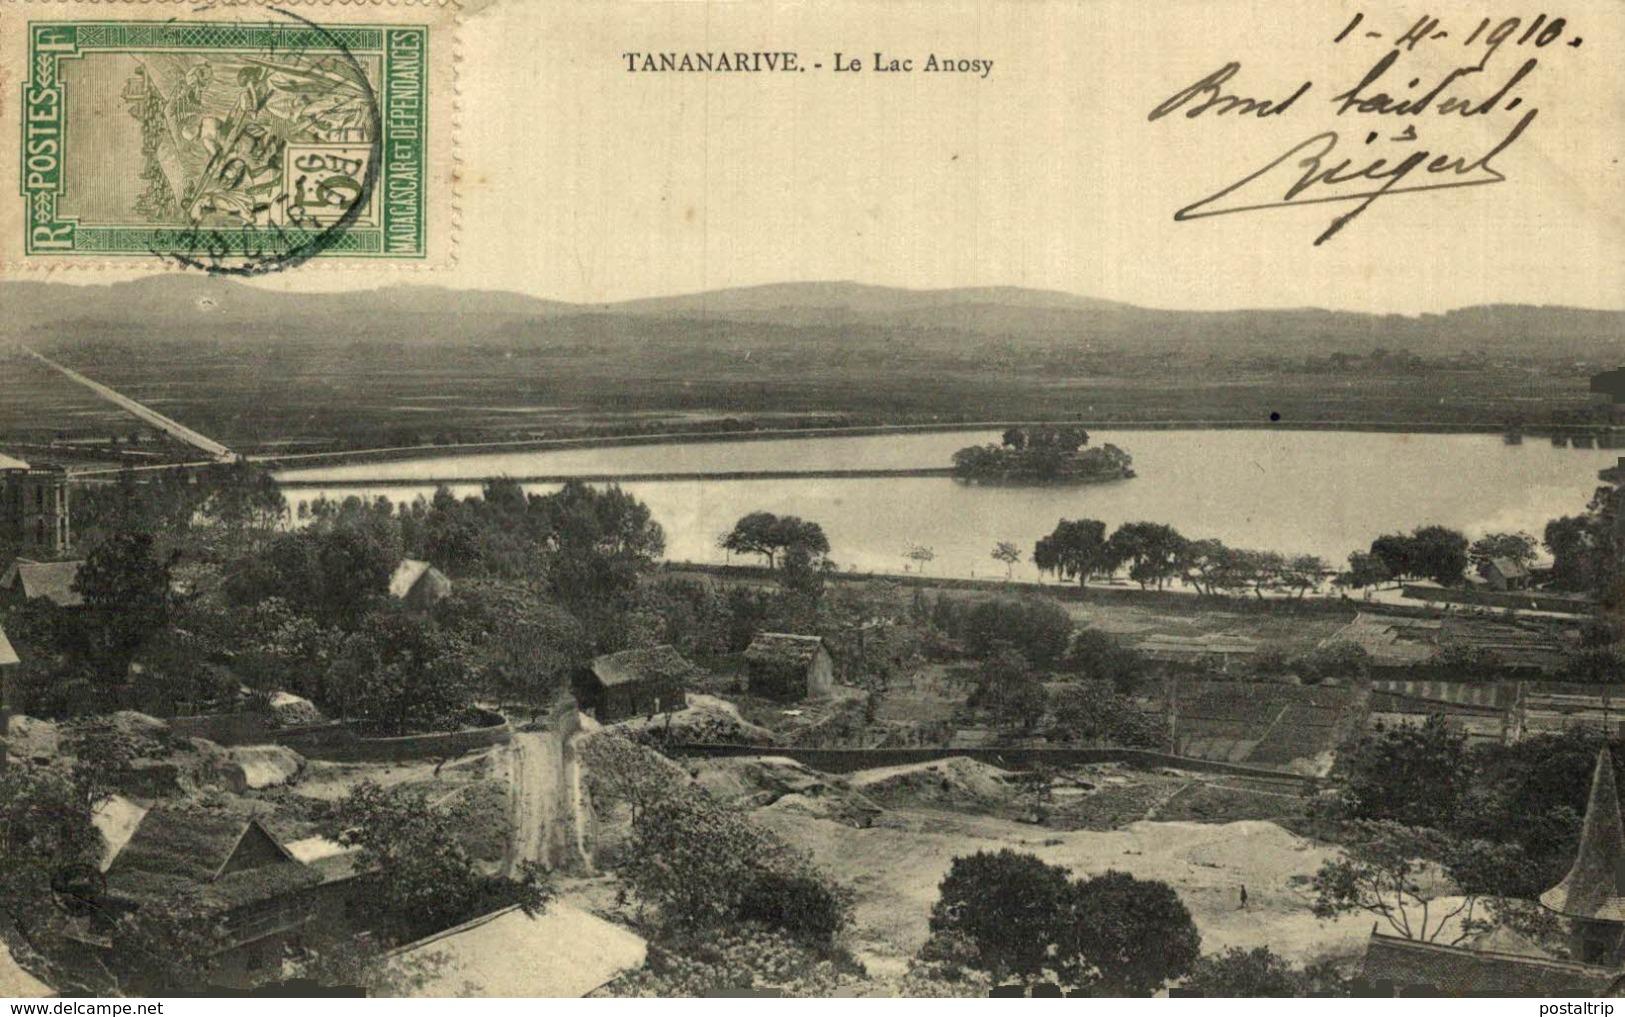 TANANARIVE LE LAC ANOSY - Madagascar